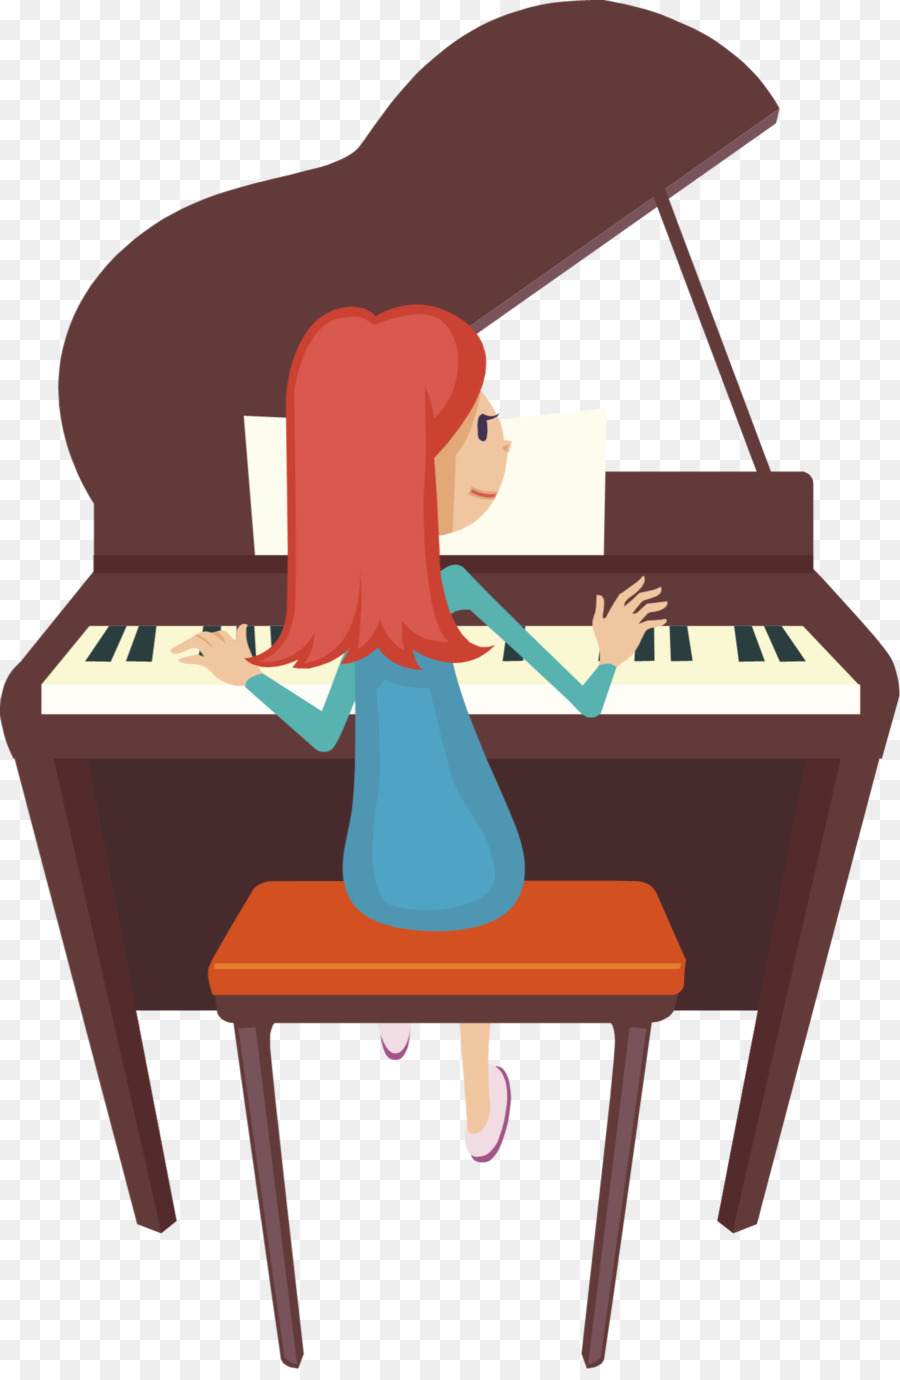 Cartoon table keyboard transparent. Piano clipart piano recital